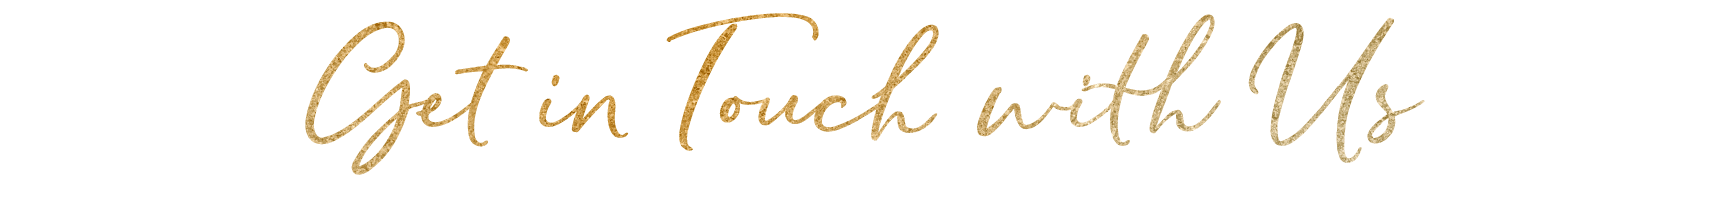 FlourishWebGetinTouch.png